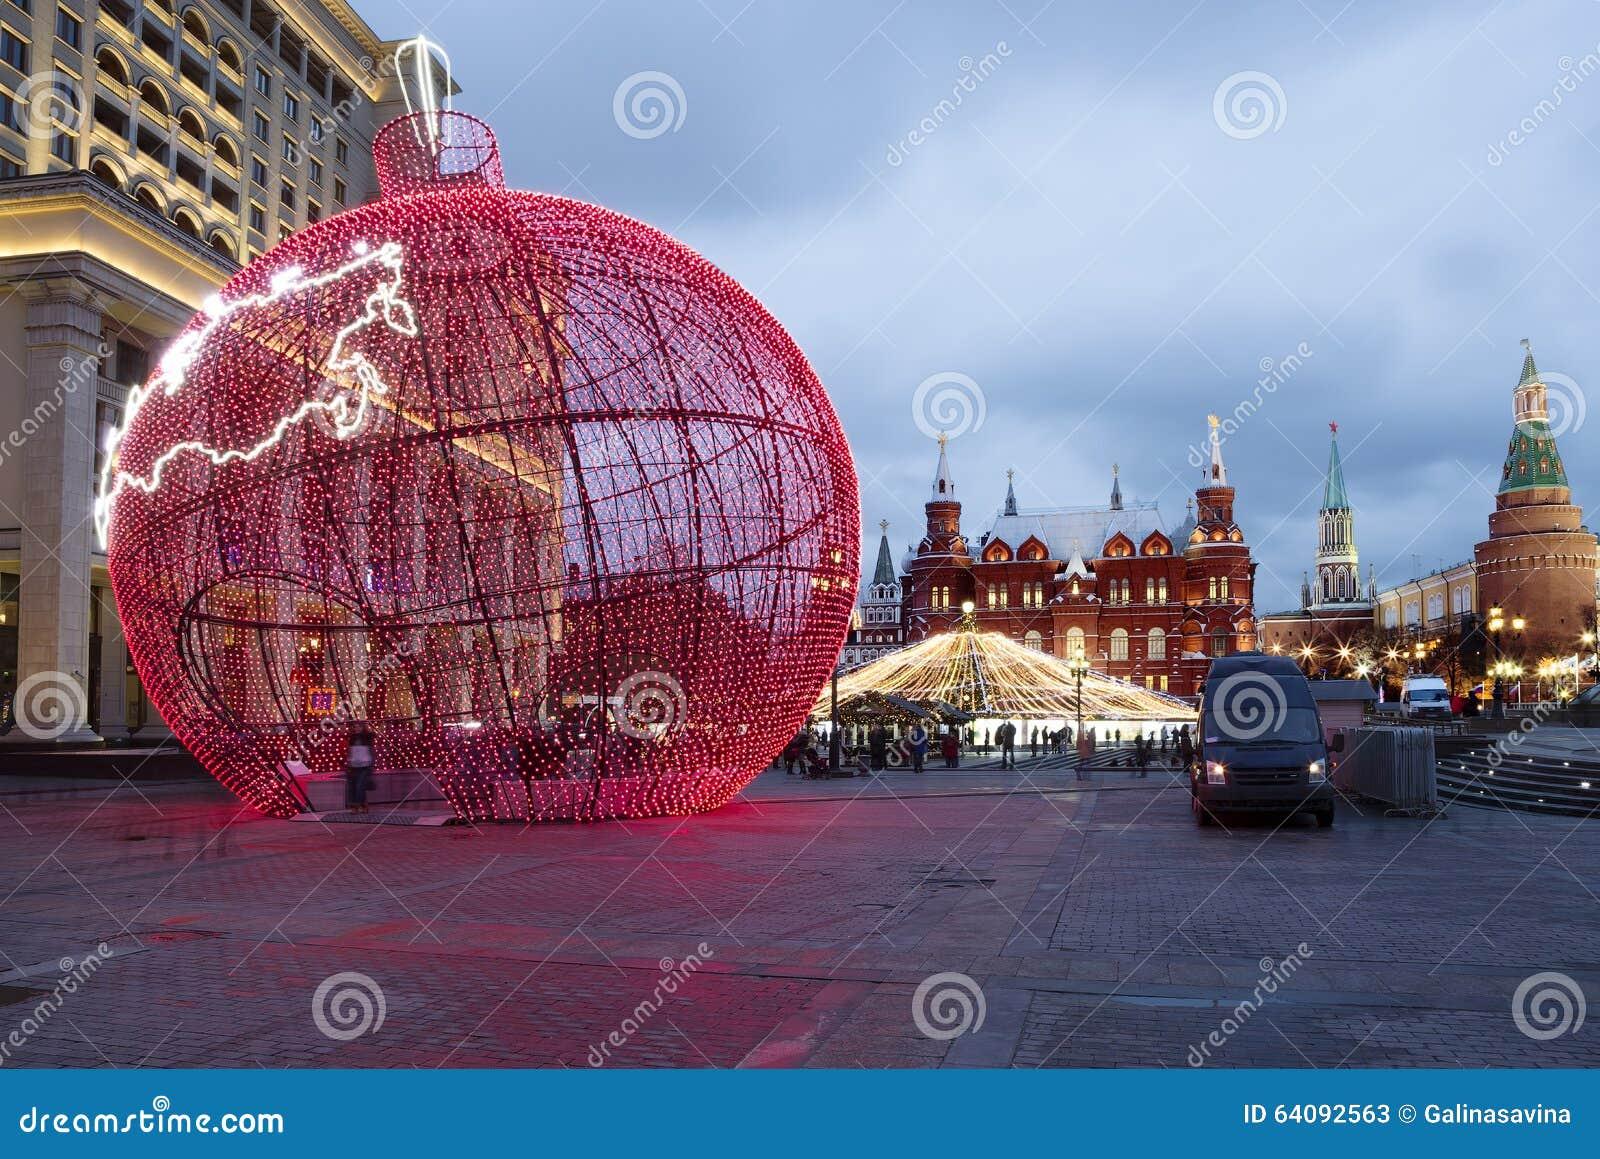 Christmas Decoration Manezhnaya Square In Moscow Stock ...